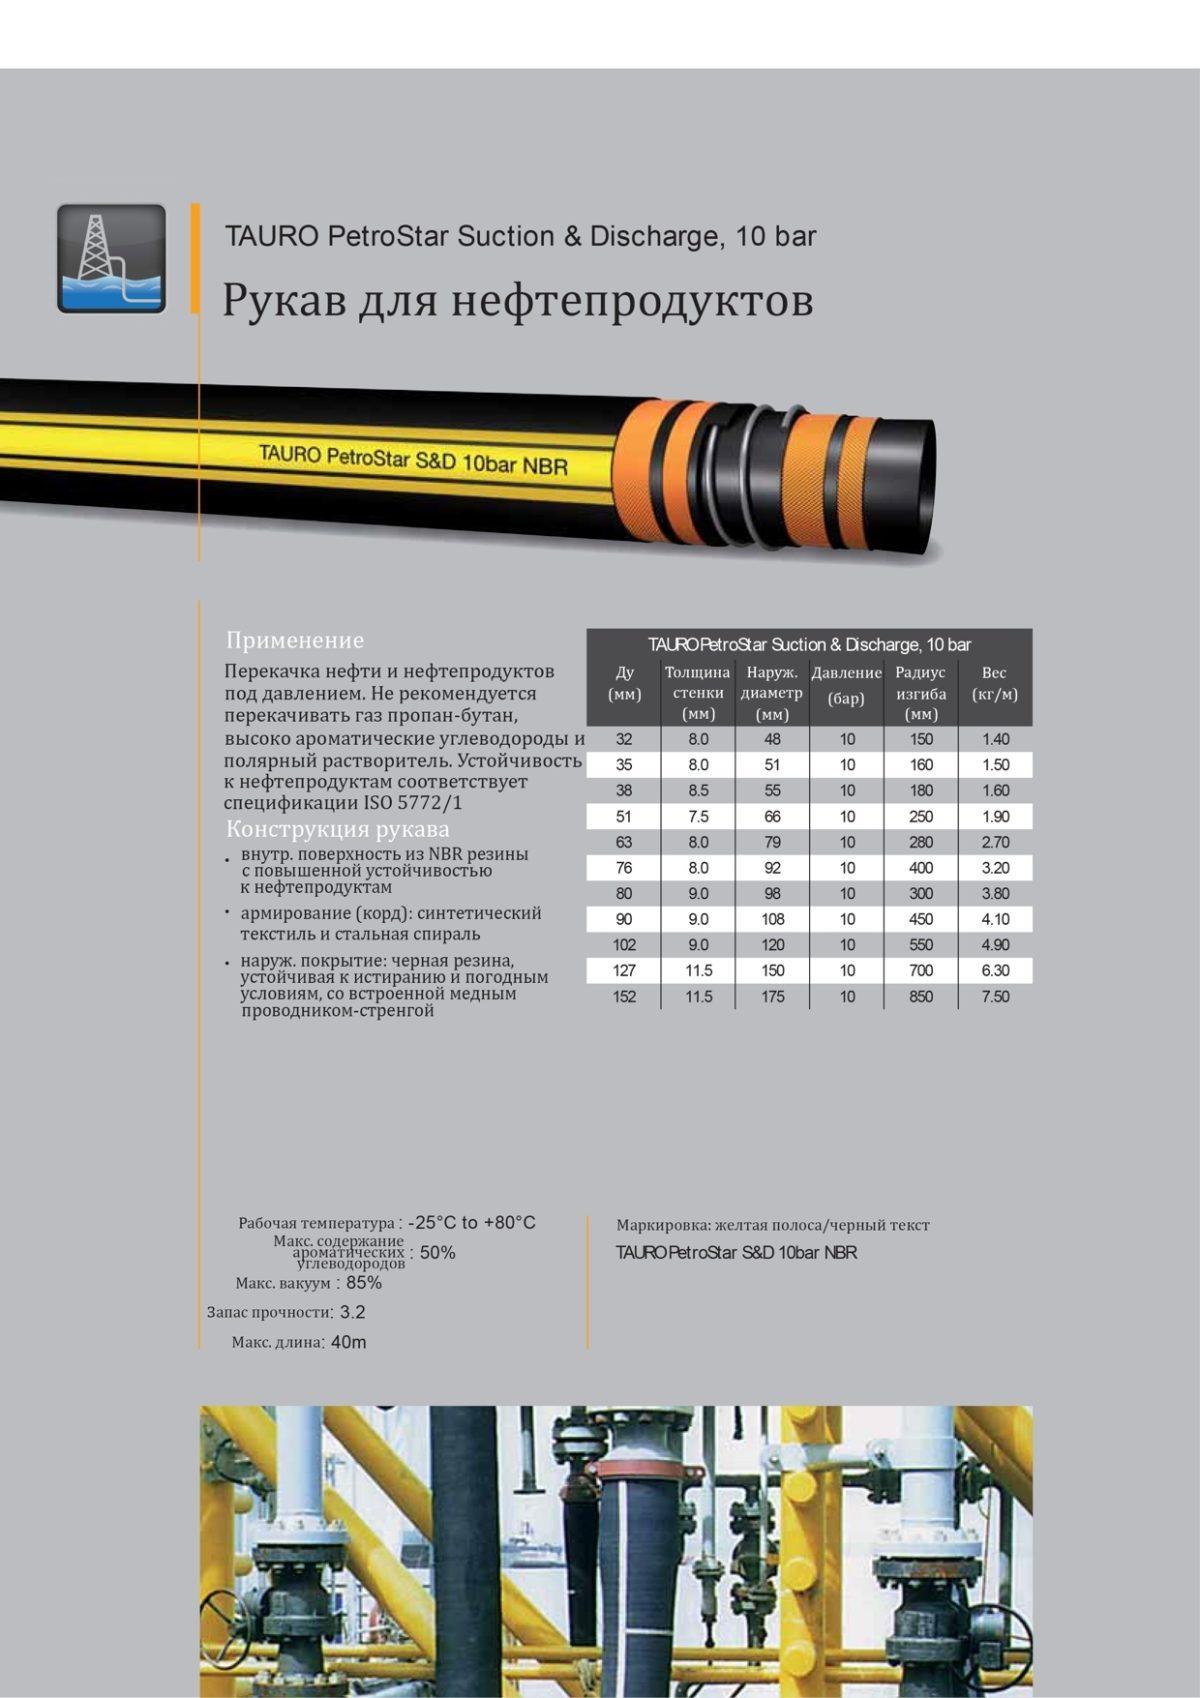 TAURO PetroStar Suction and Discharge 10 bar Рукав для нефтепродуктов